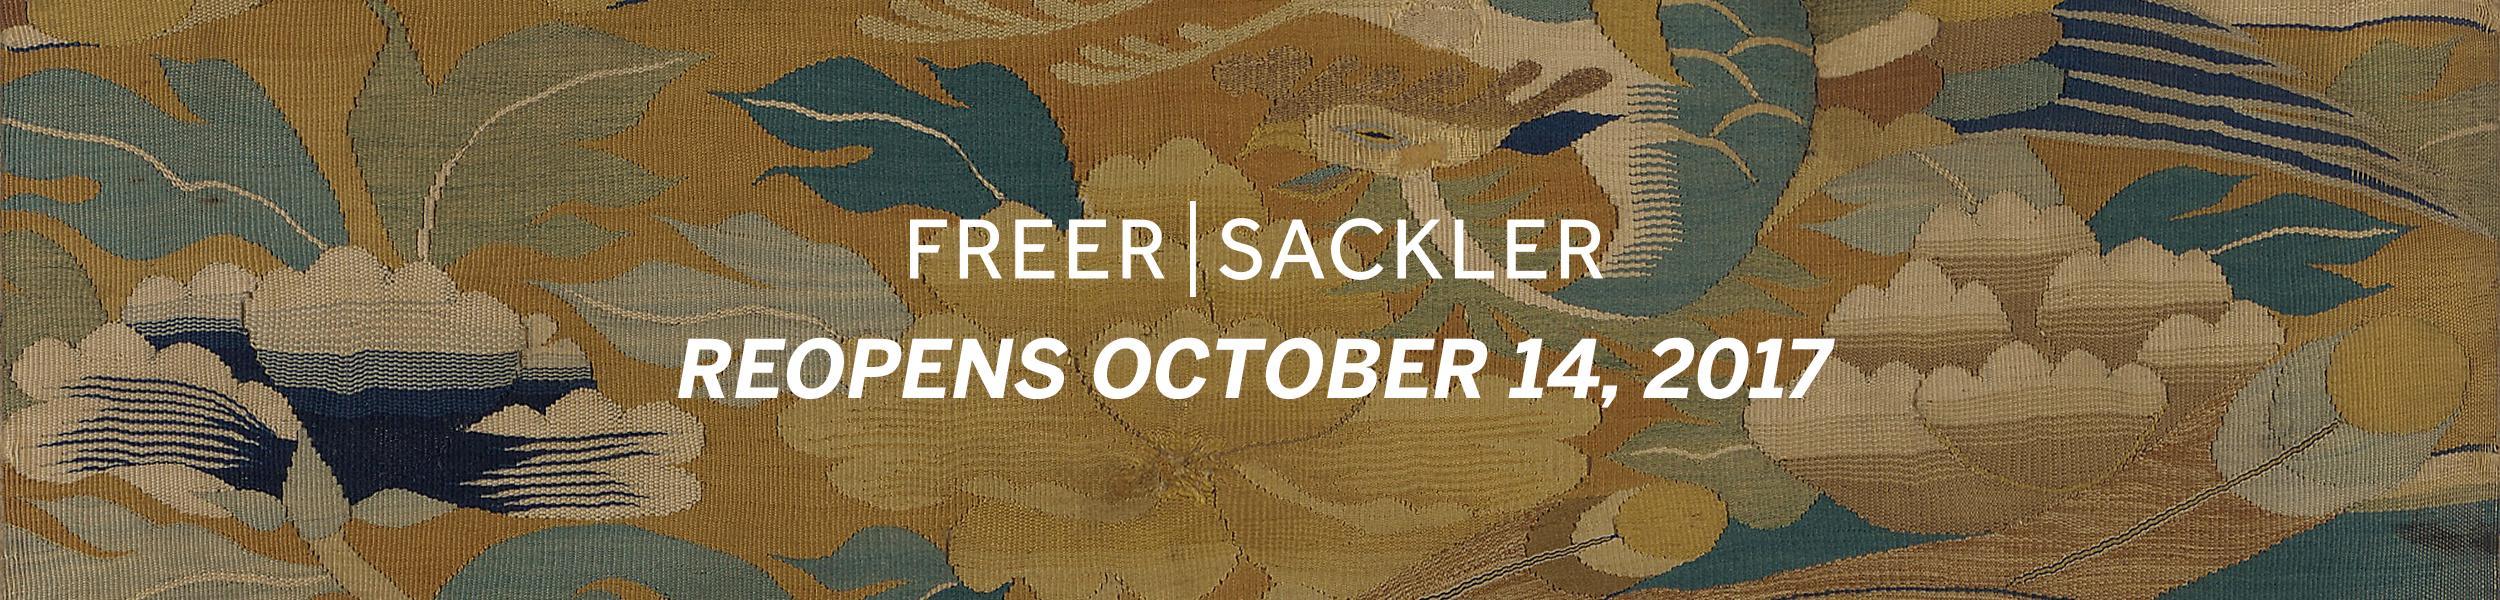 Freer Sackler Reopened